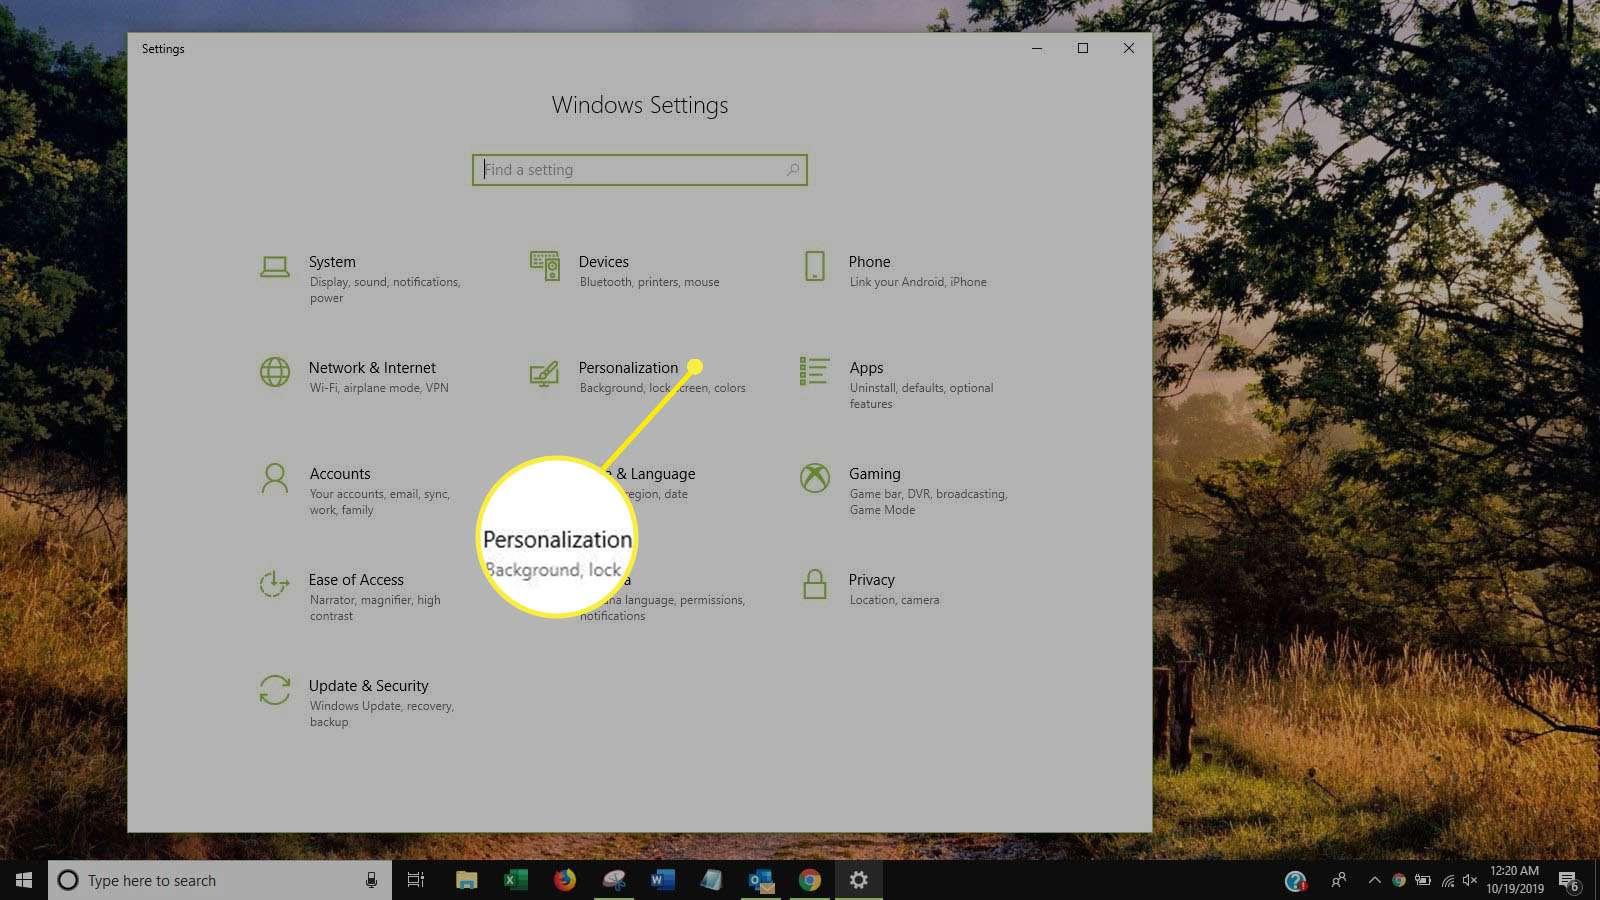 Screenshot of Personalization in Windows Settings